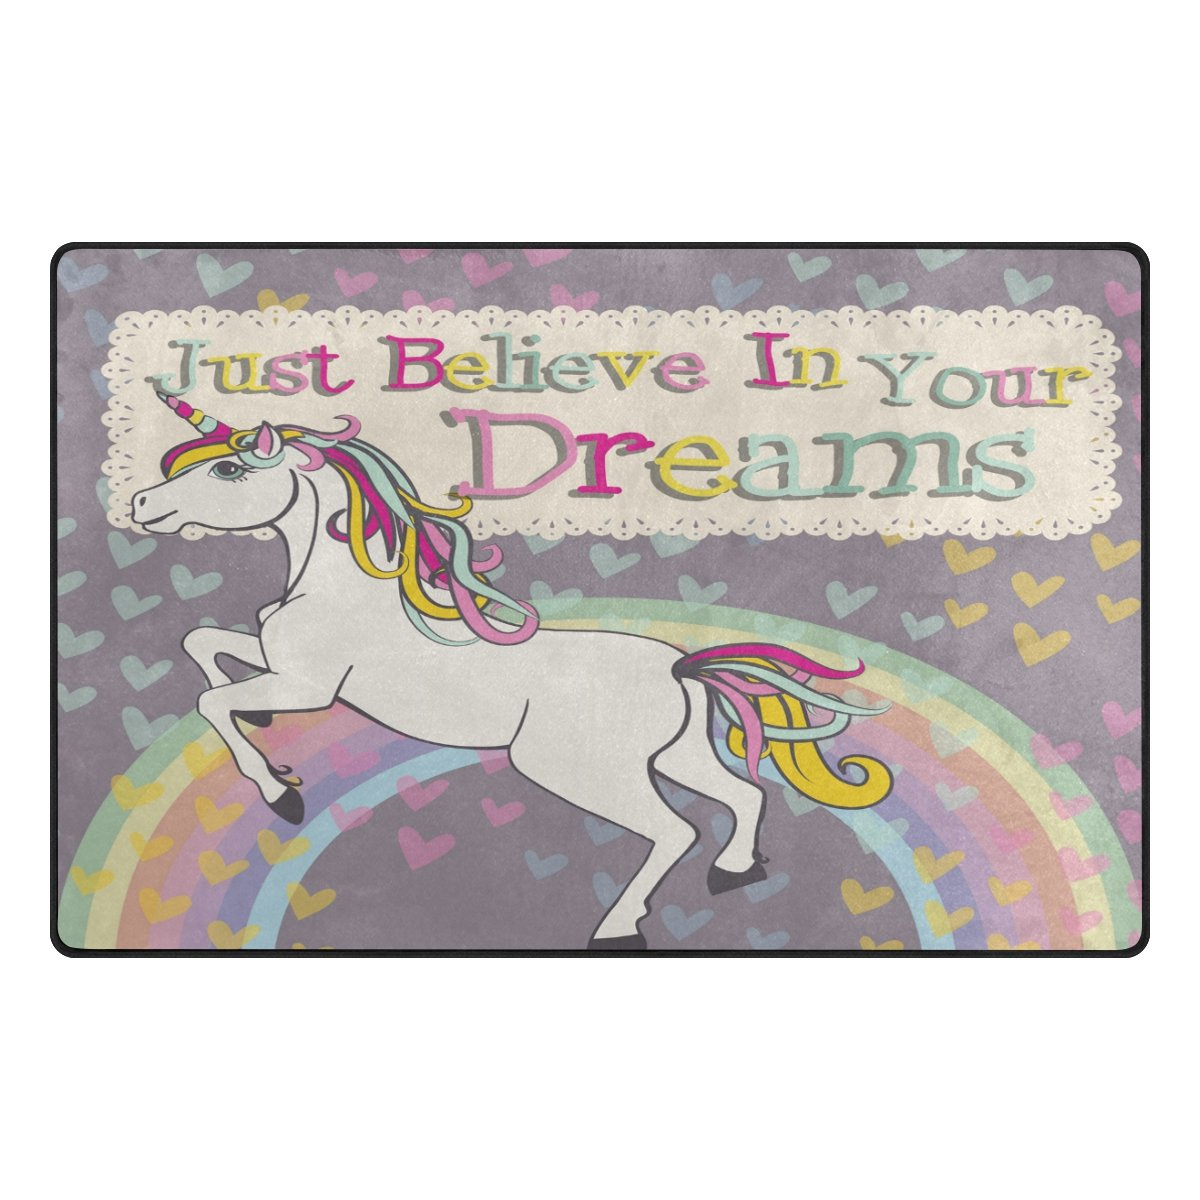 48 x 63 Inches // 120 x 160 cm Rainbow Unicorn Nursery Rug Floor Carpet Yoga Mat 4 x 5 Naanle Unicorn Non Slip Area Rug for Living Dinning Room Bedroom Kitchen